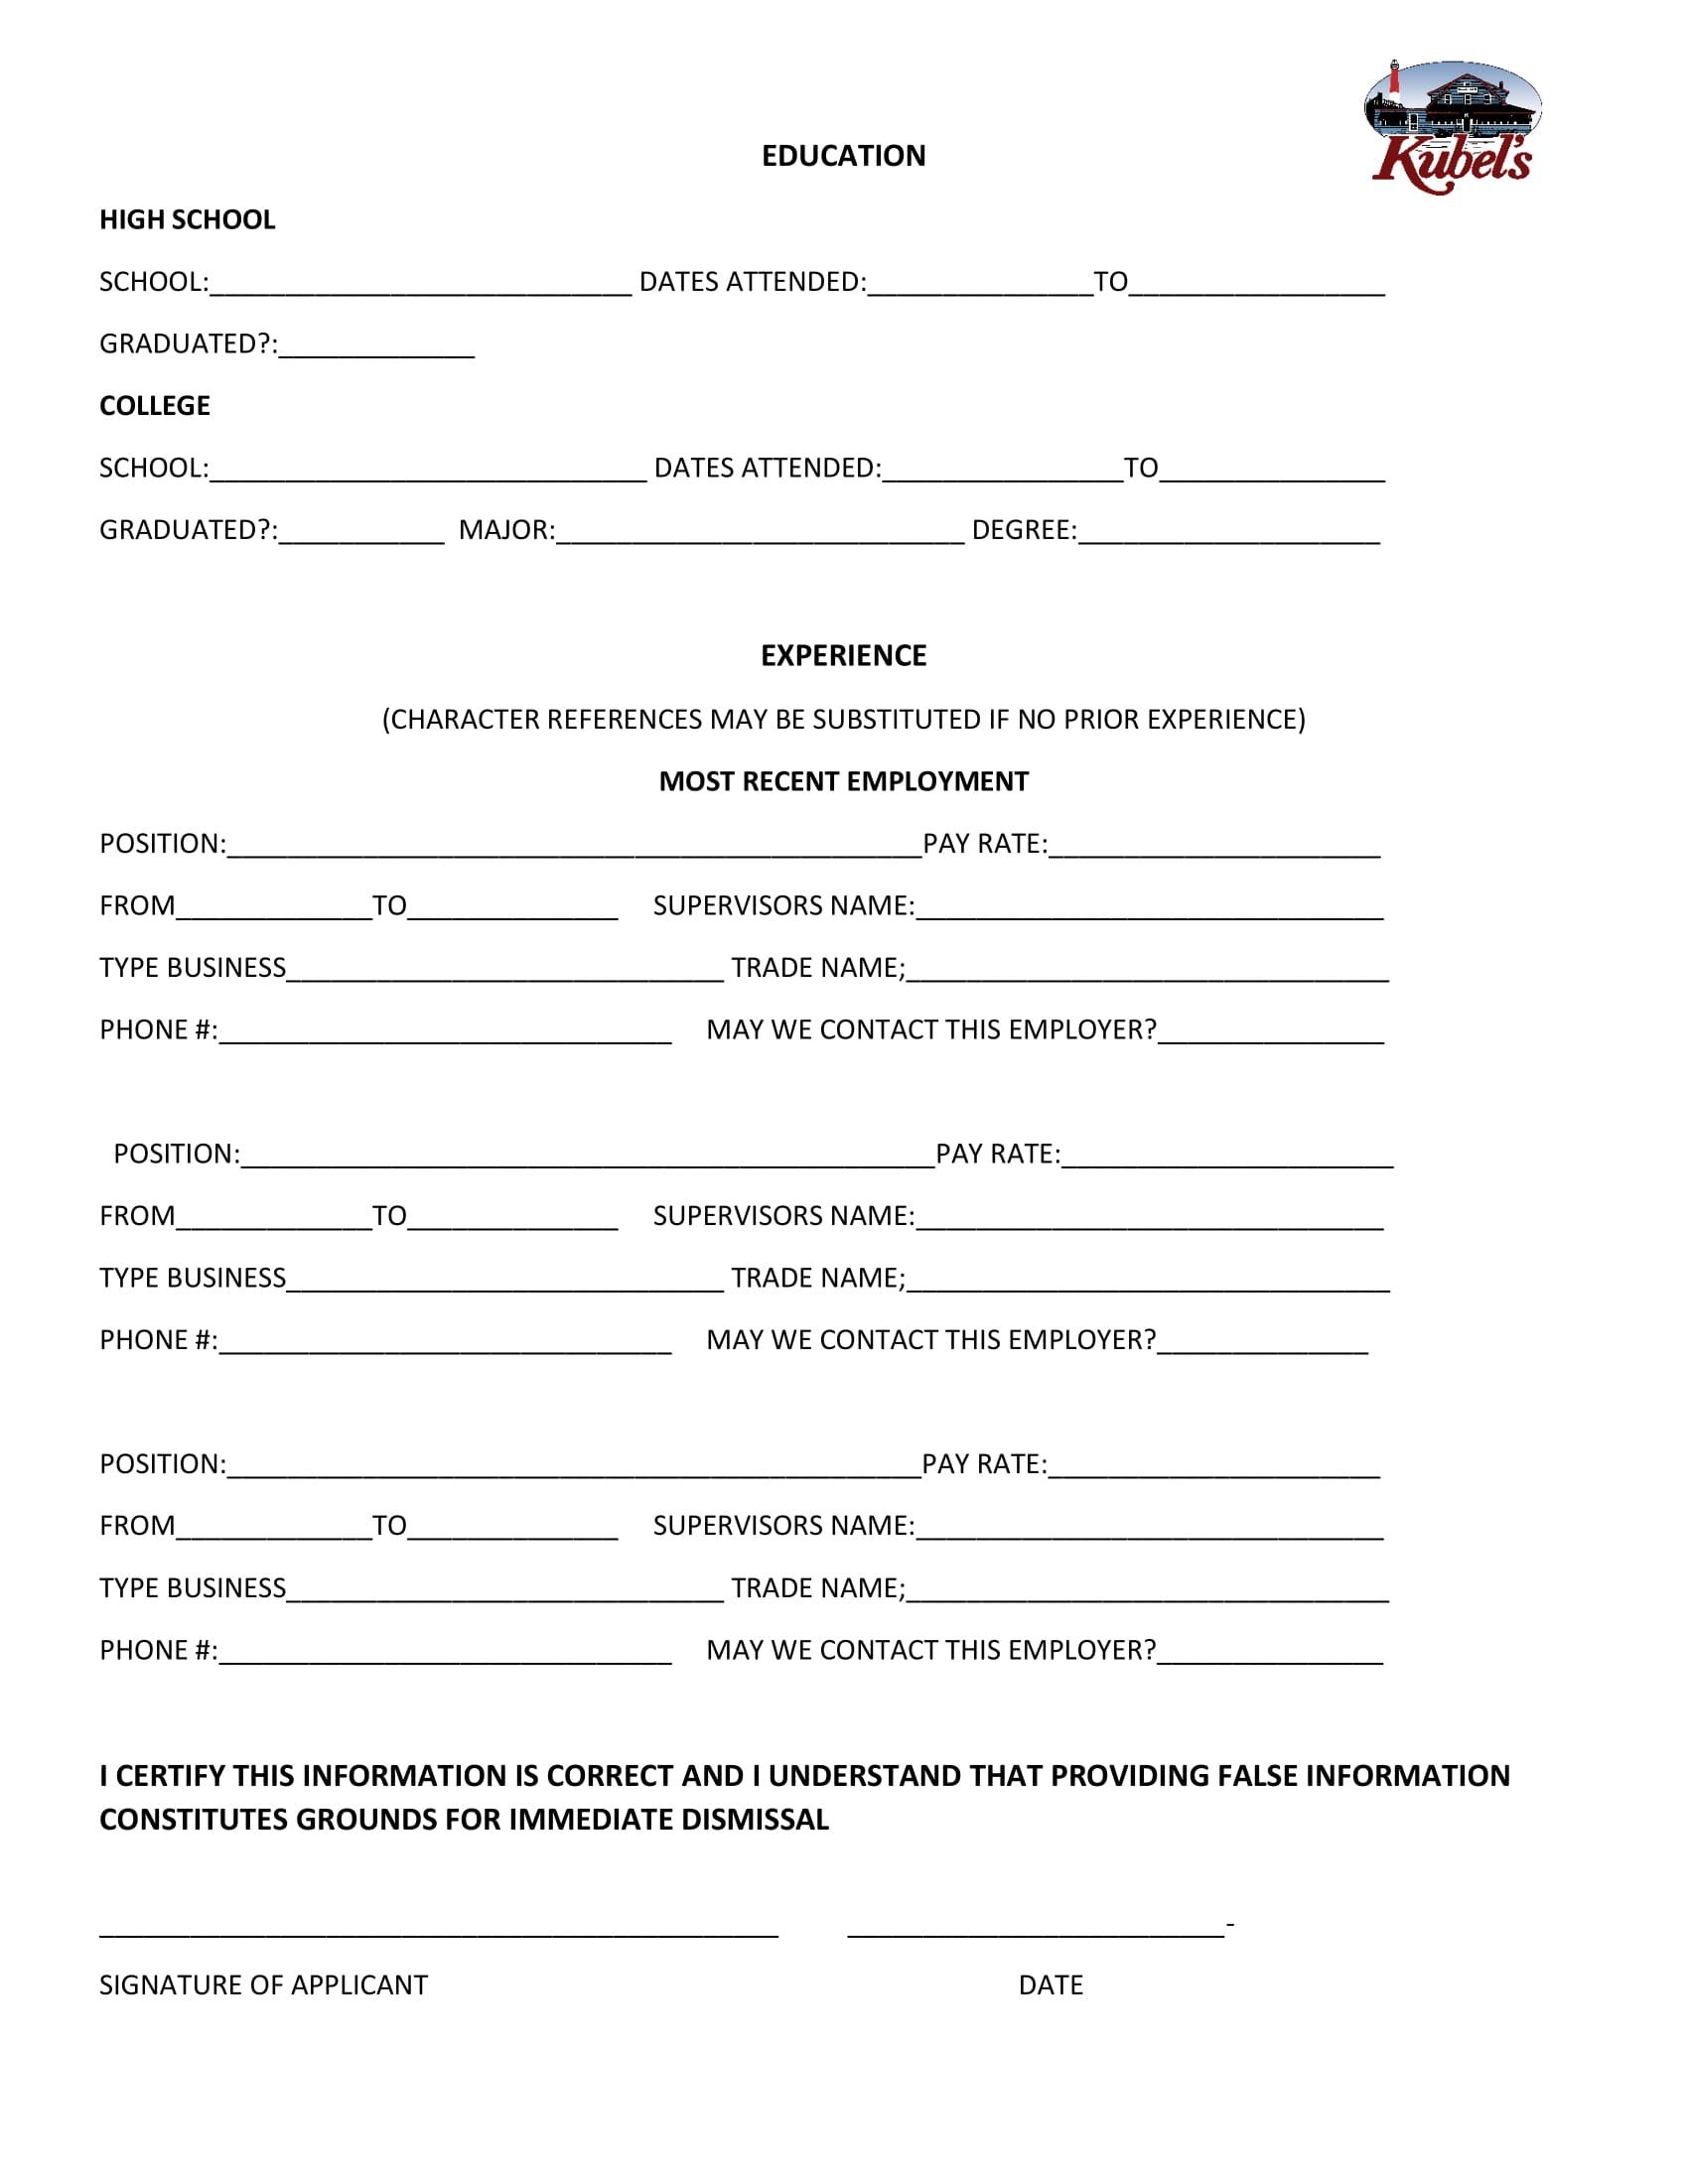 APPLICATION FOR EMPLOYMENT-2.jpg